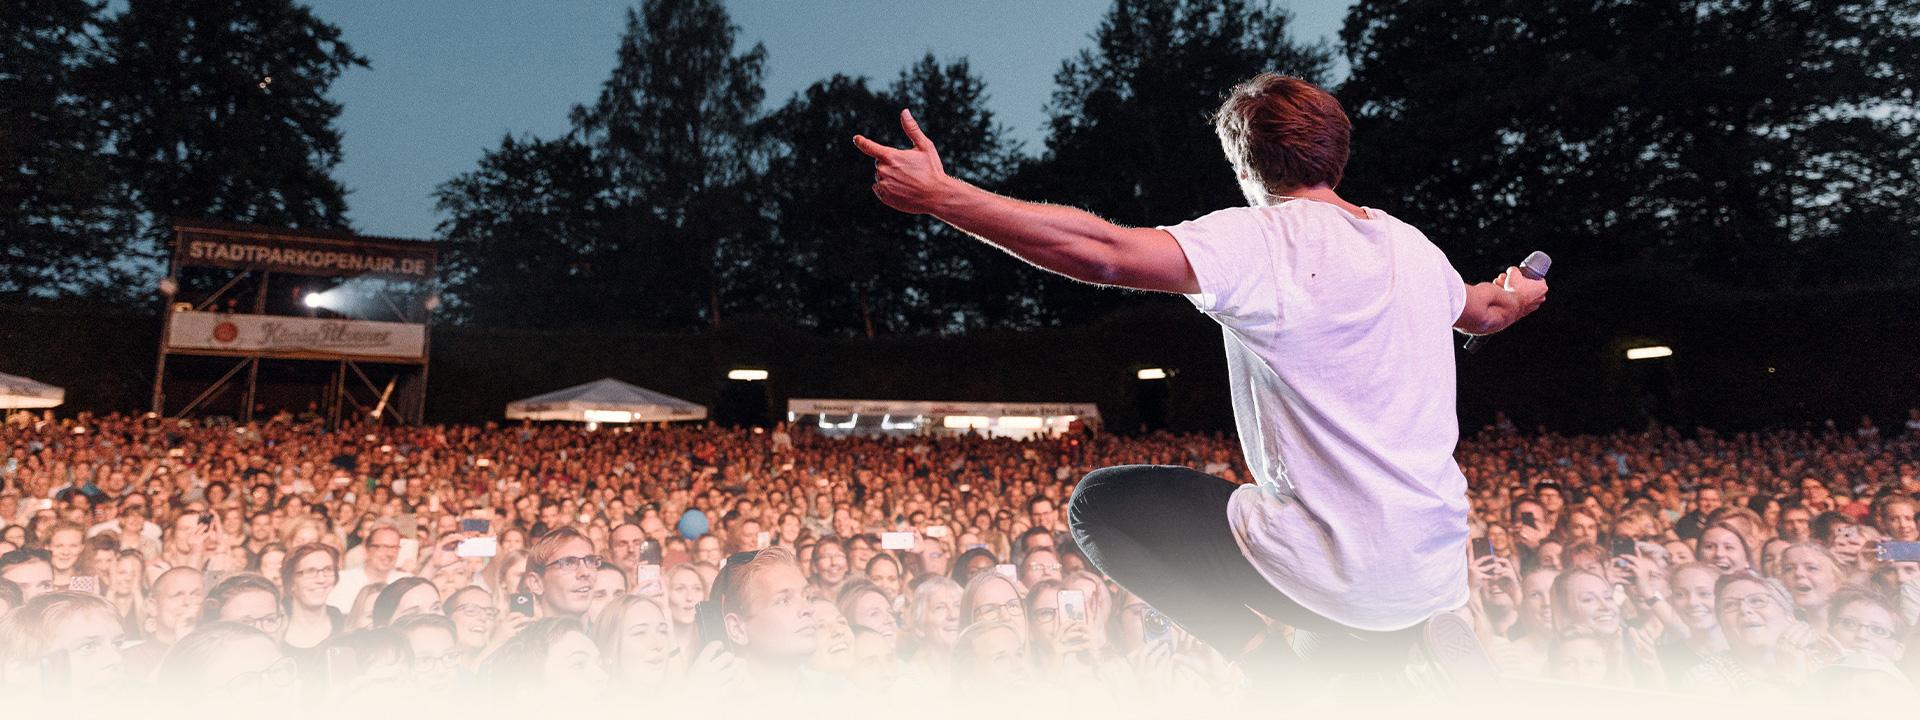 Live — Max Giesinger | Die offizielle Website